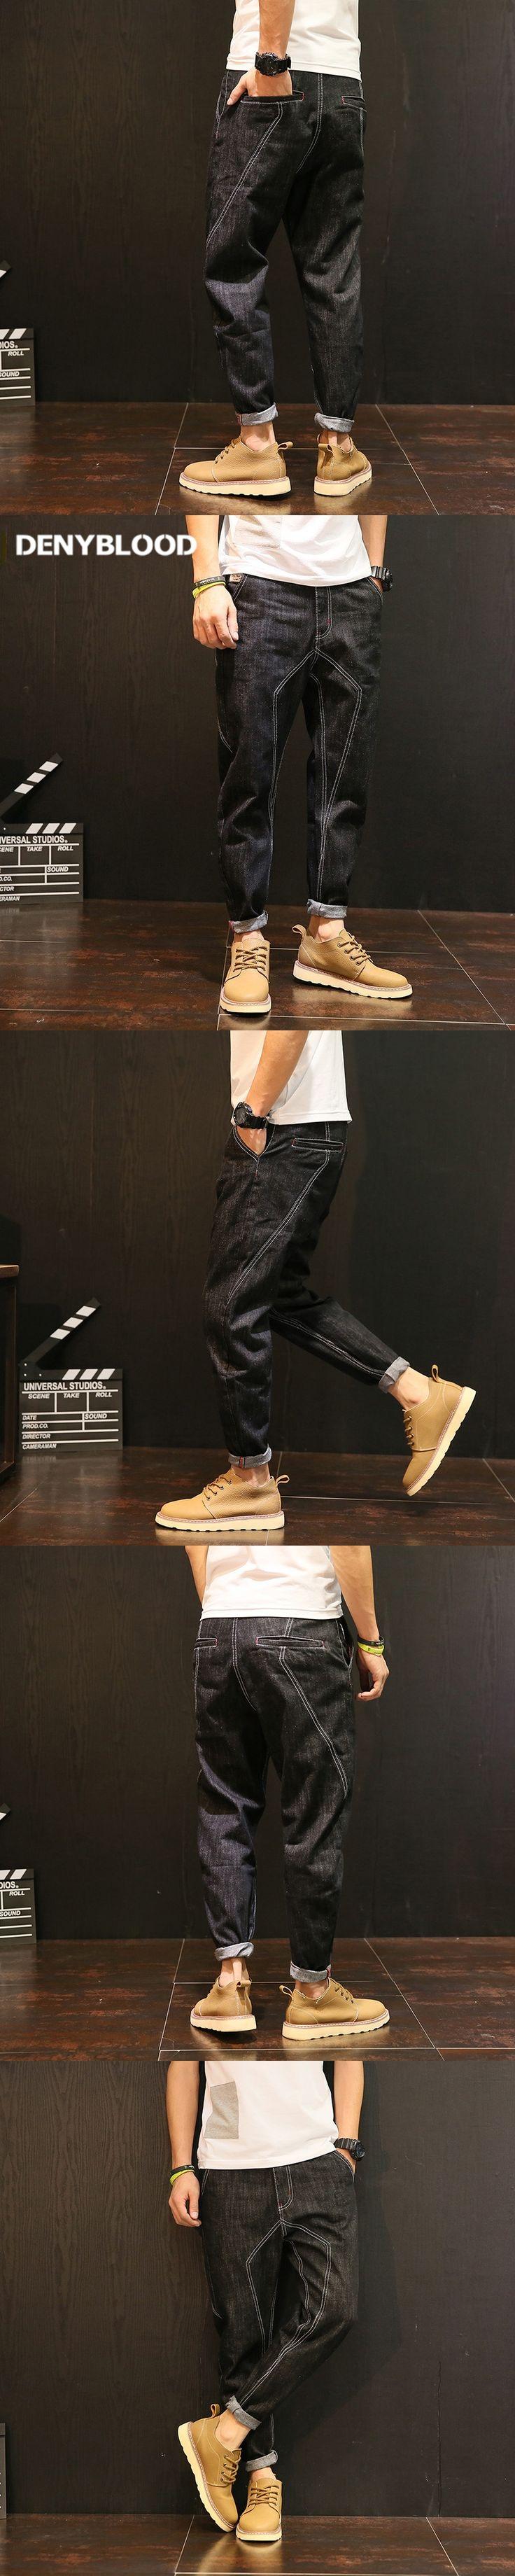 Denyblood Jeans Mens Black Denim Jeans Hip-Pop Harem Pants for Man Mutil Cutting Seams Slim Bottom Loose Fit Casual Pants 5136